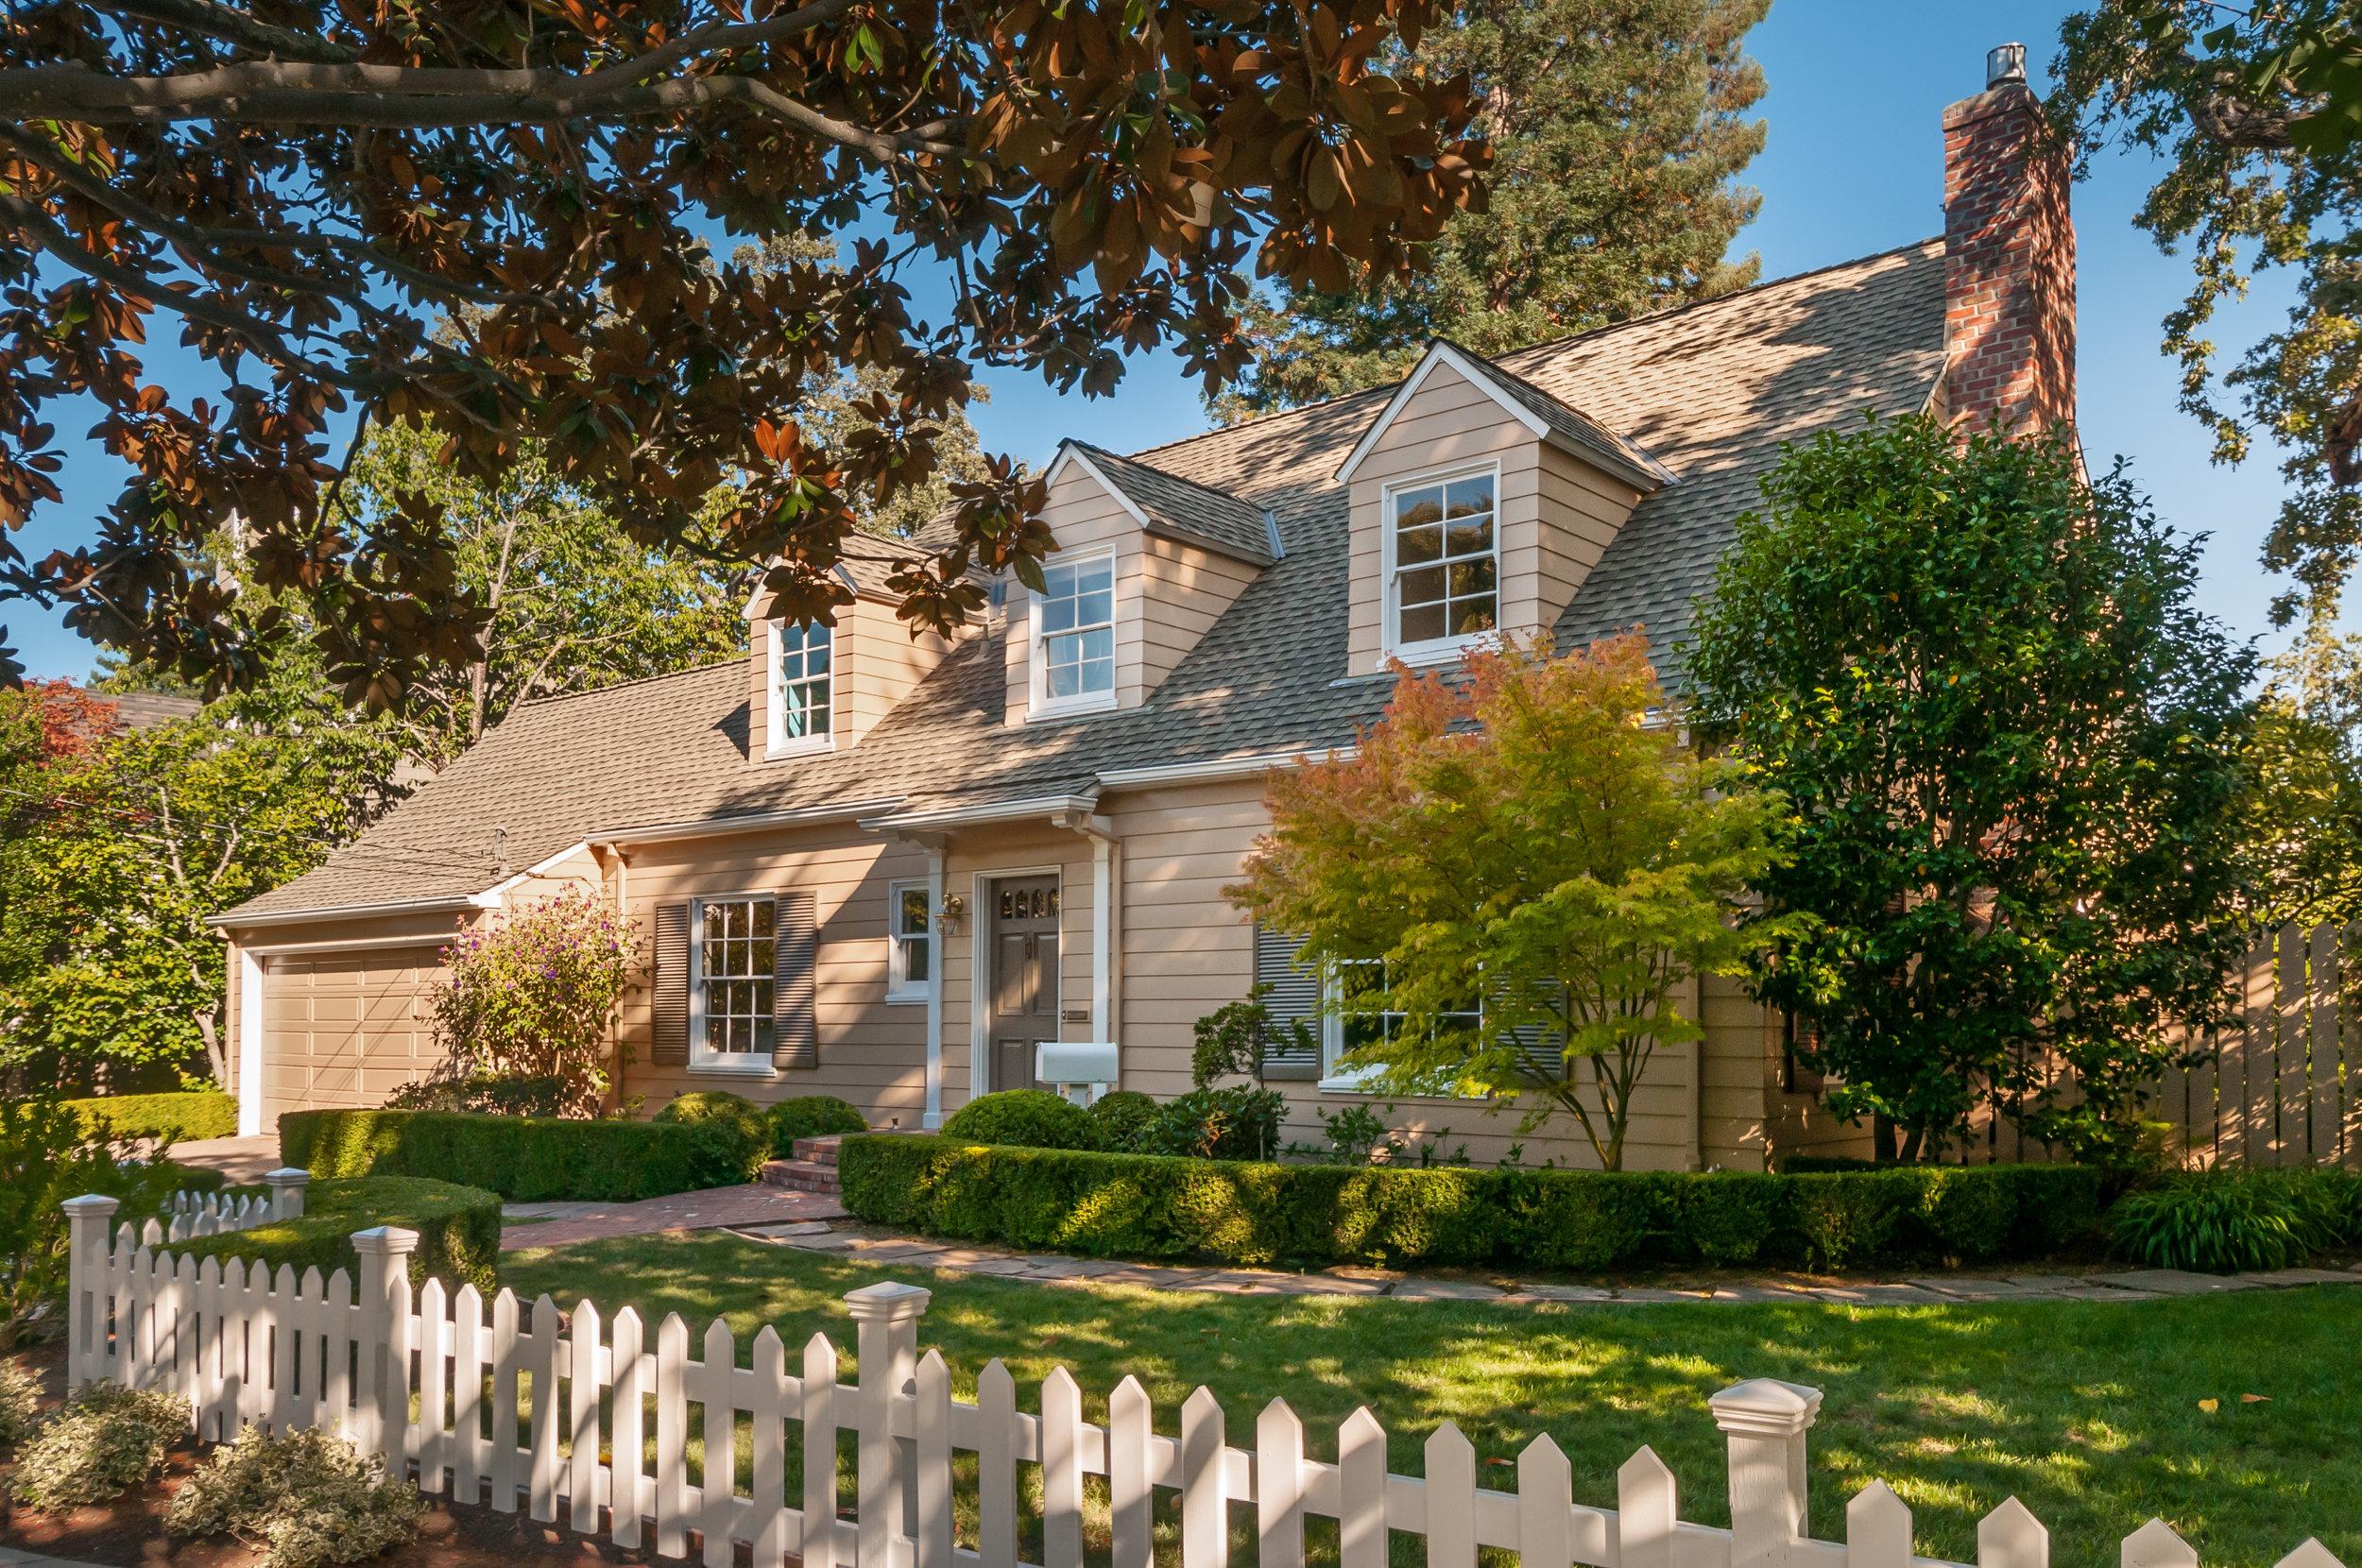 899 Blandford Blvd, Redwood City, CA | $2,795,000